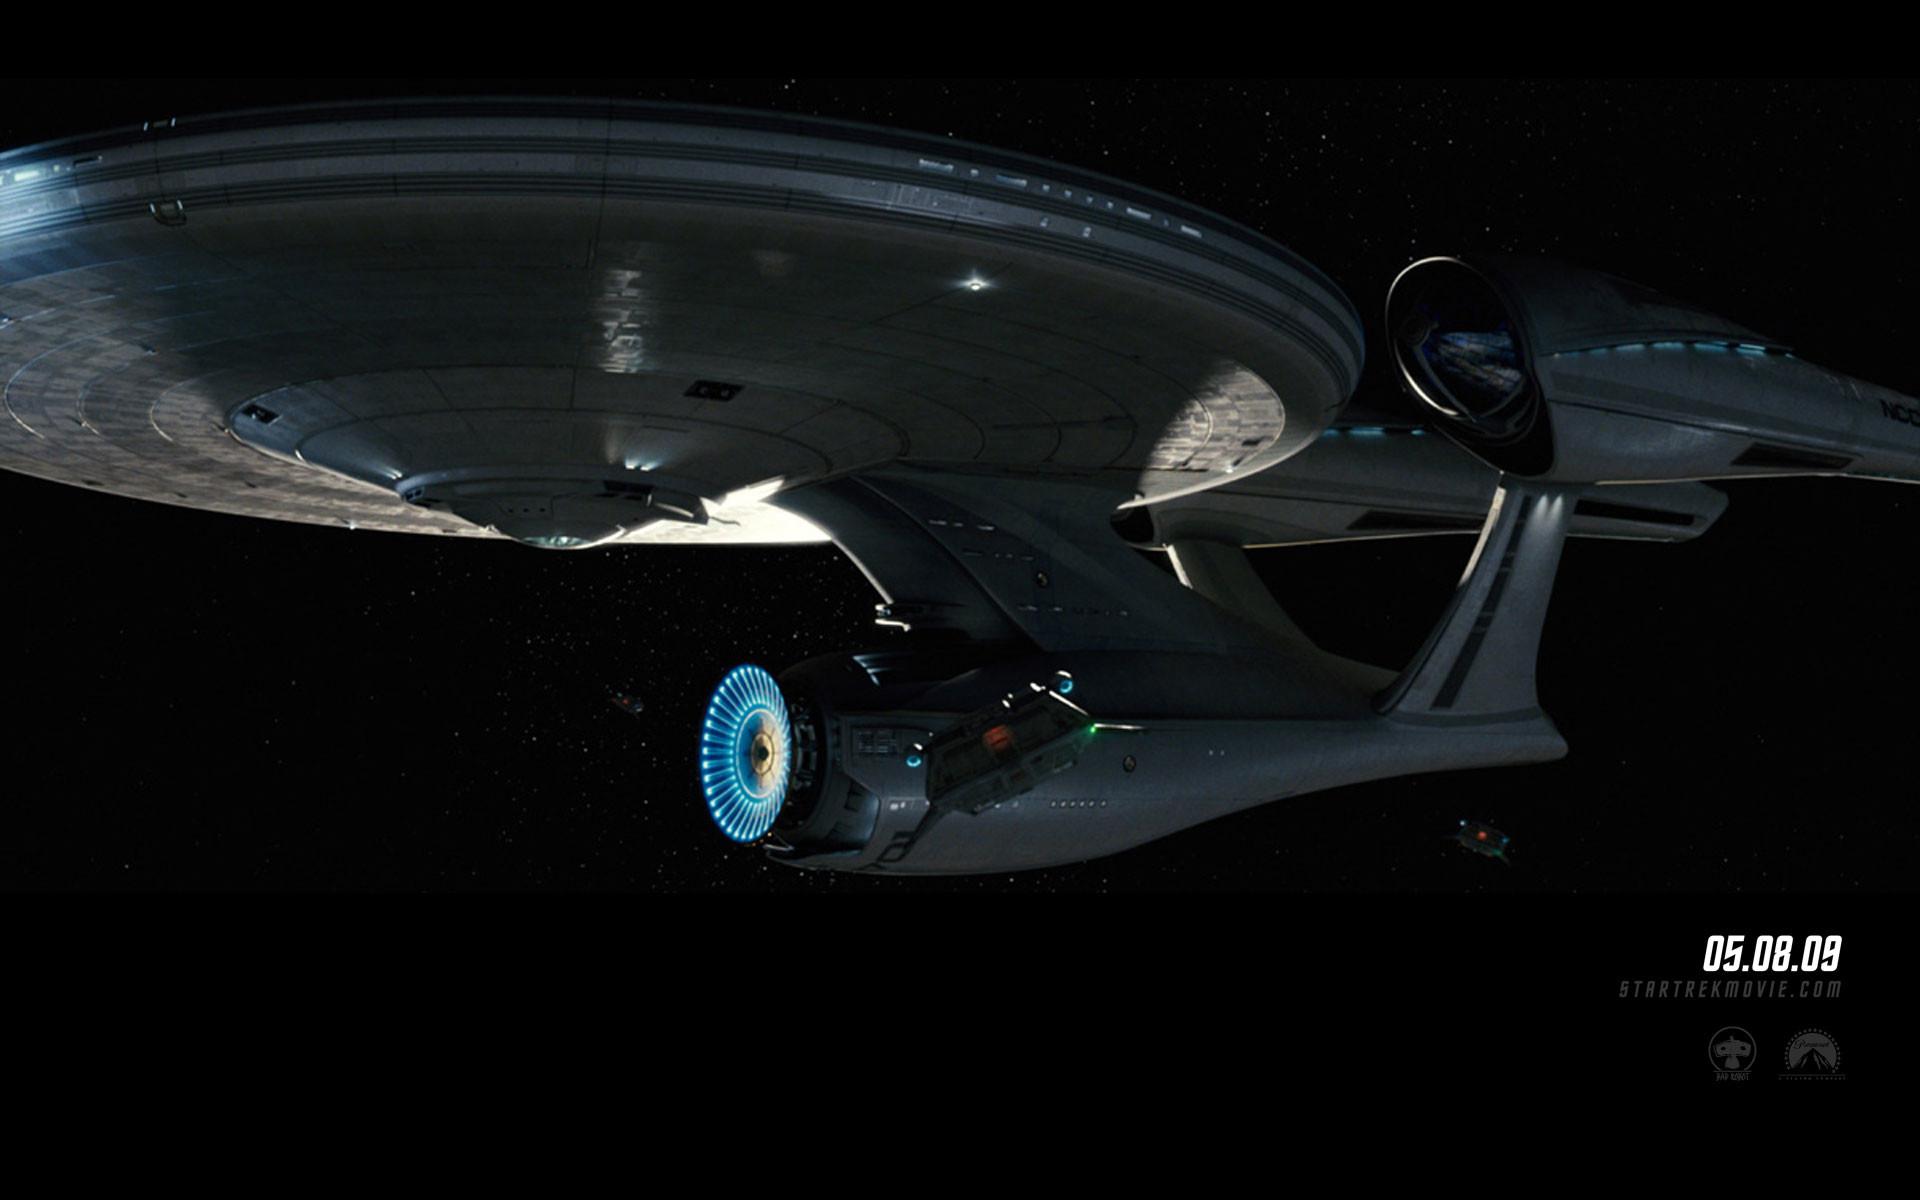 """Star Trek"" desktop wallpaper number 10 – the 2009 movie version of the USS"